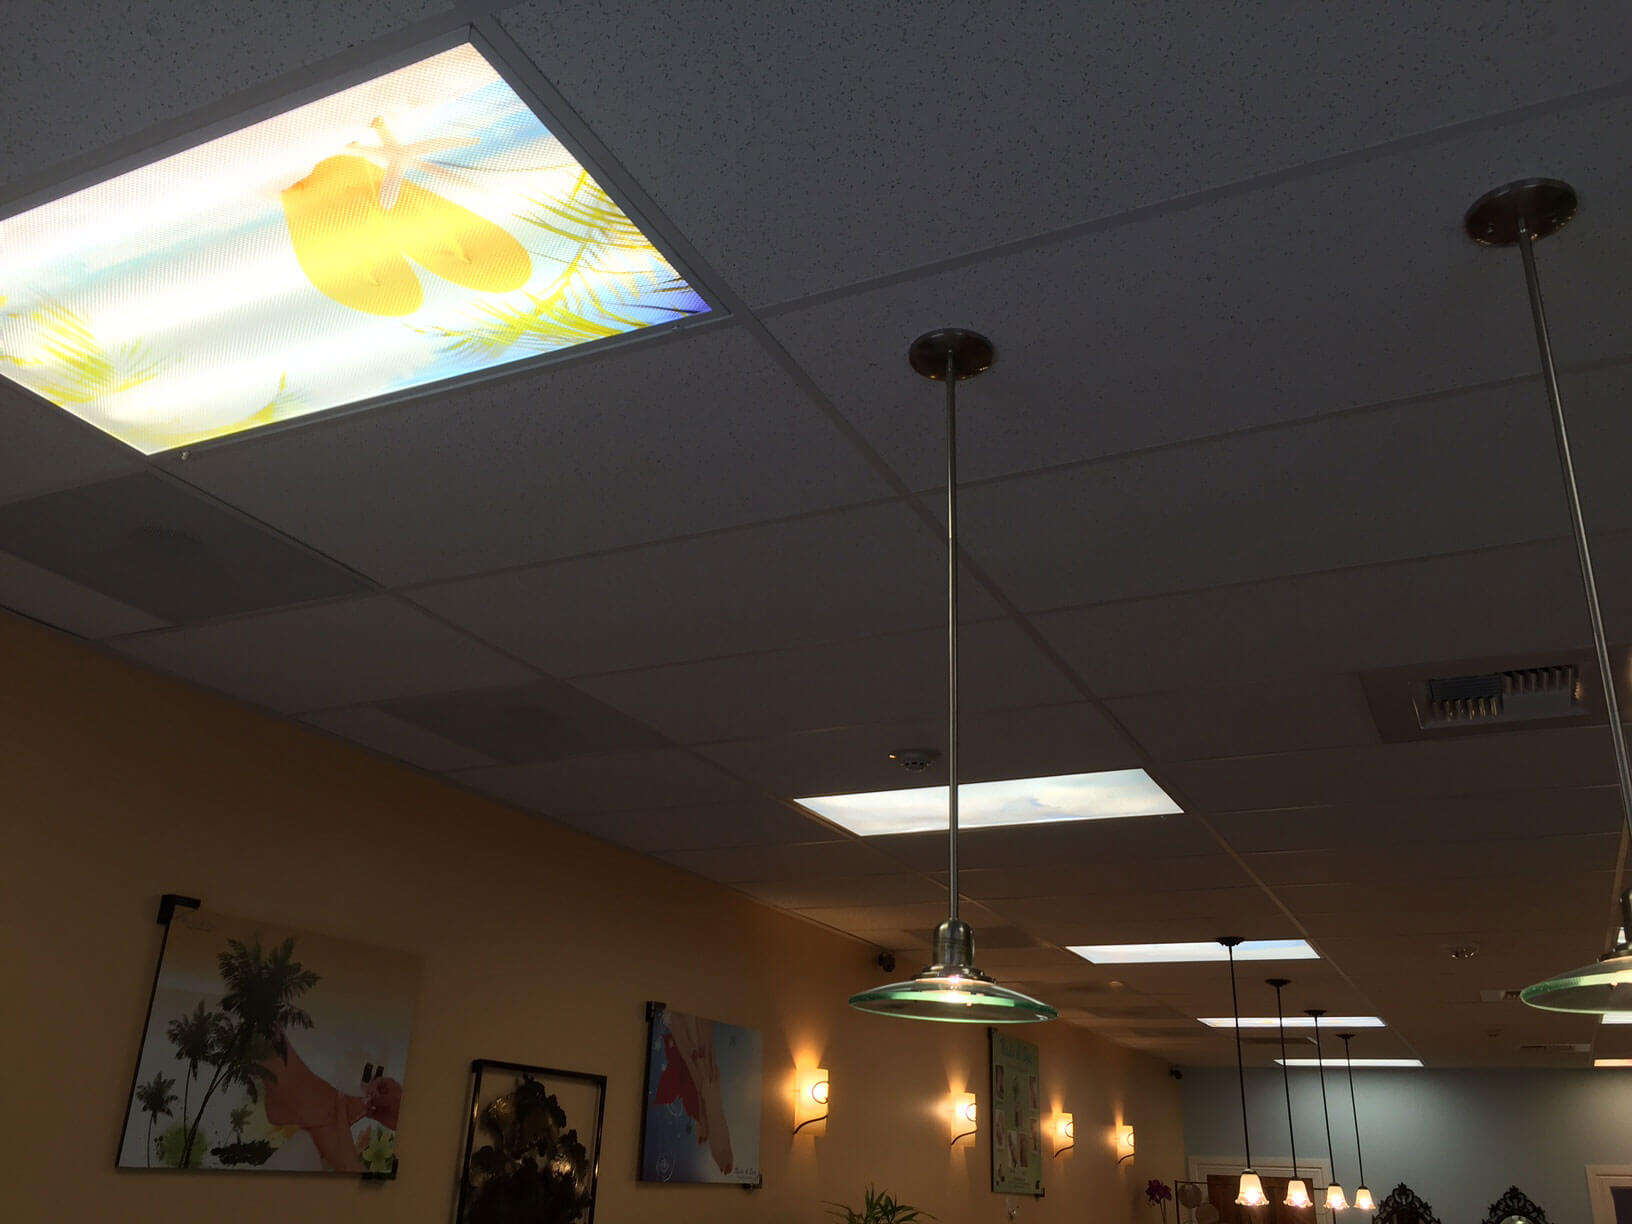 Decorative Light Cover Panels On